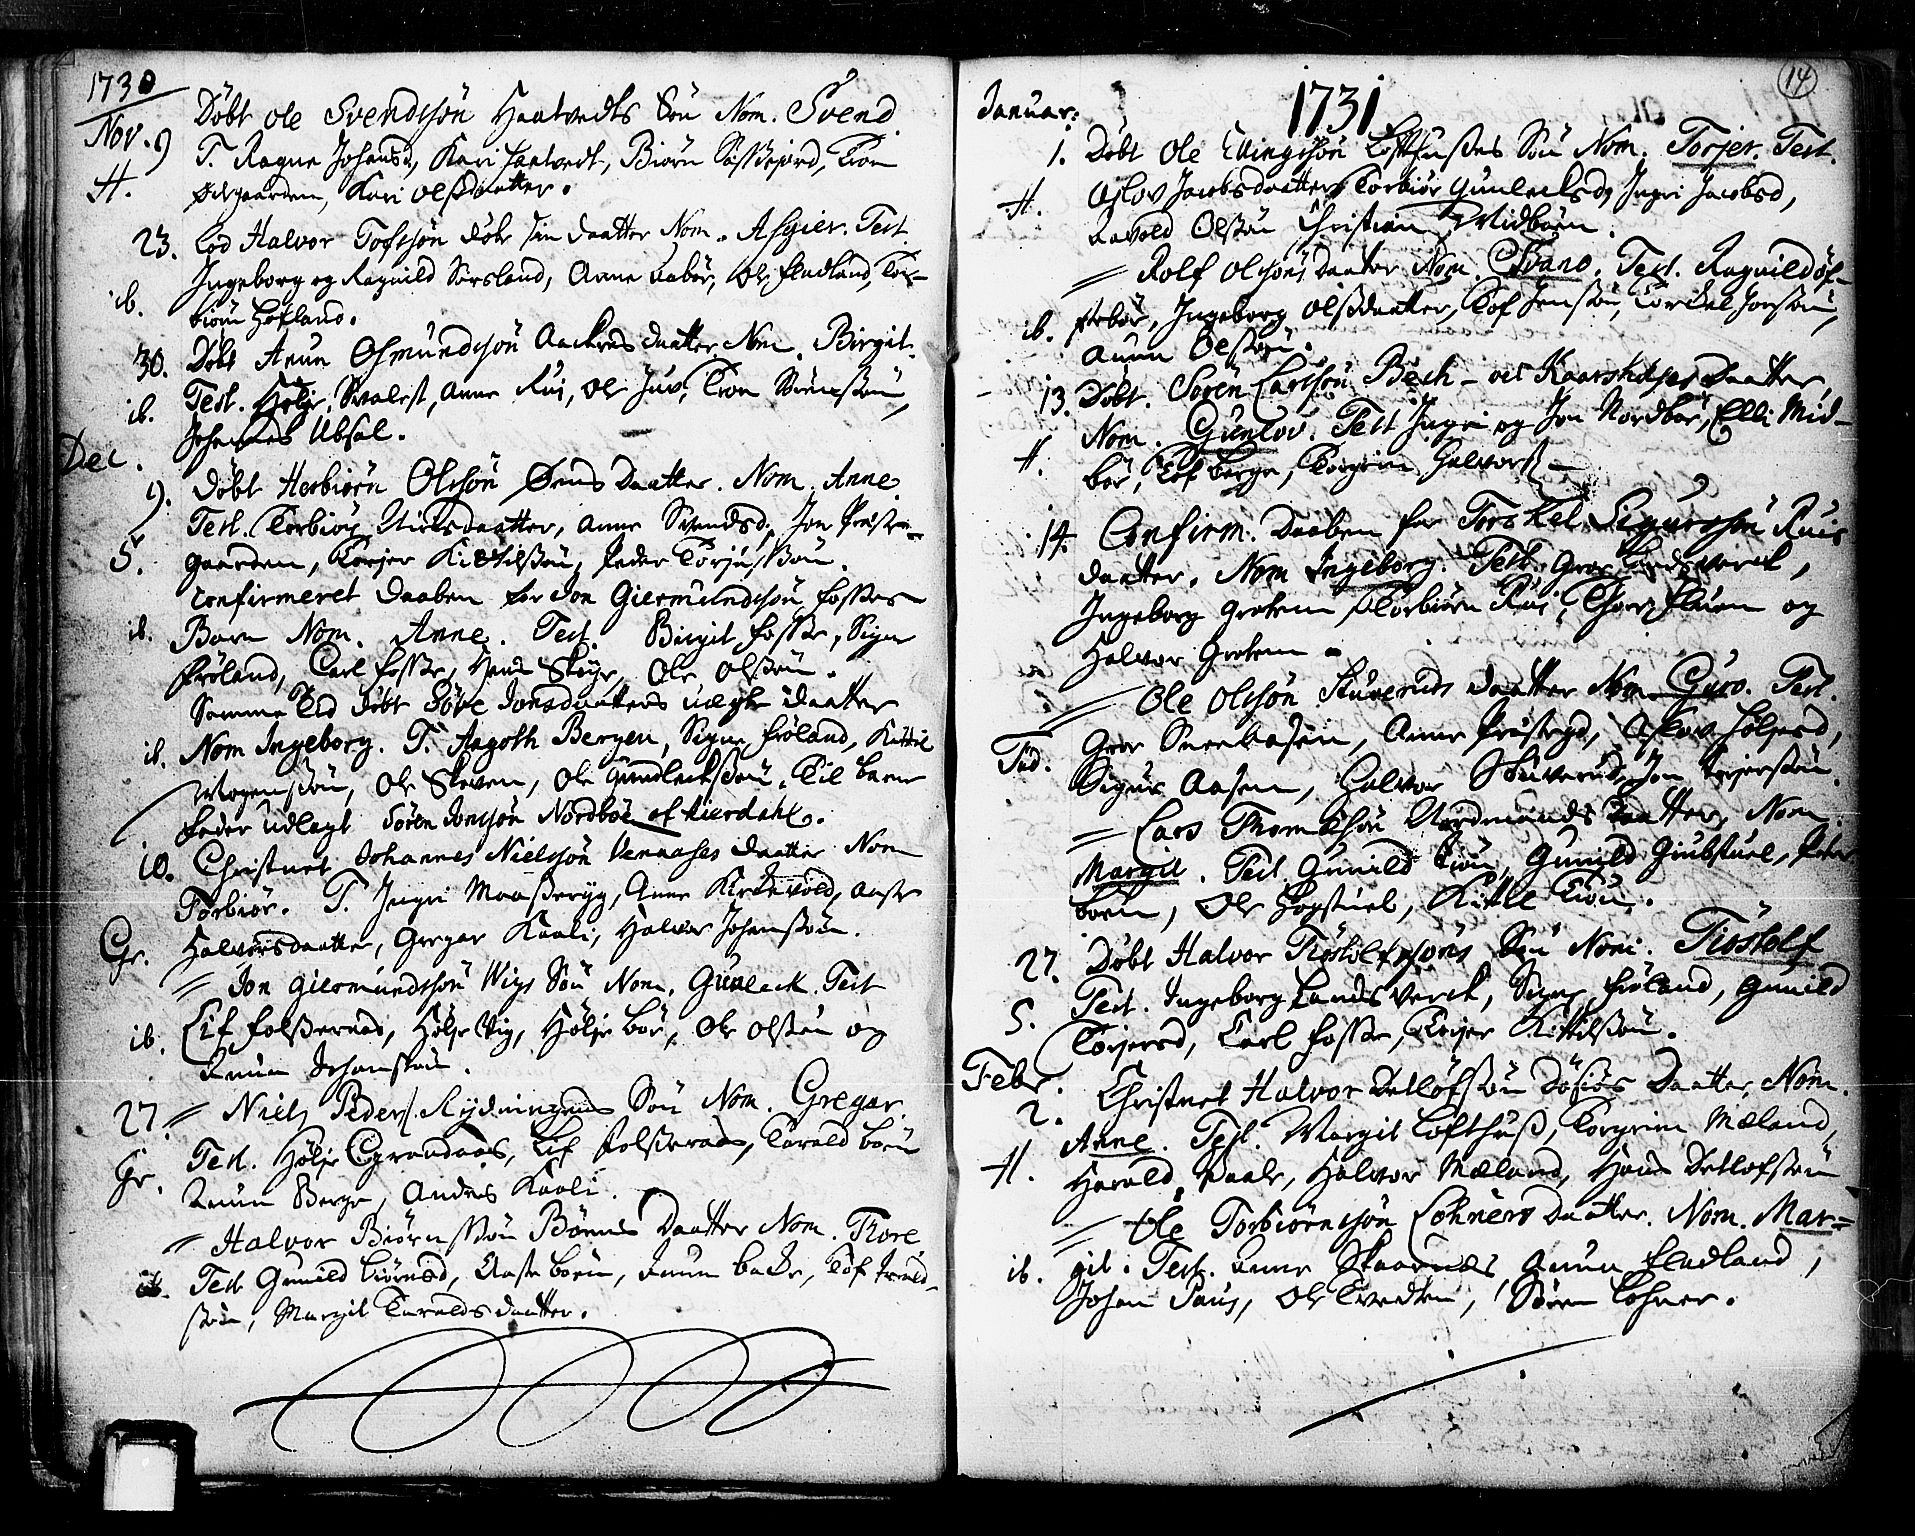 SAKO, Hjartdal kirkebøker, F/Fa/L0003: Ministerialbok nr. I 3, 1727-1775, s. 14